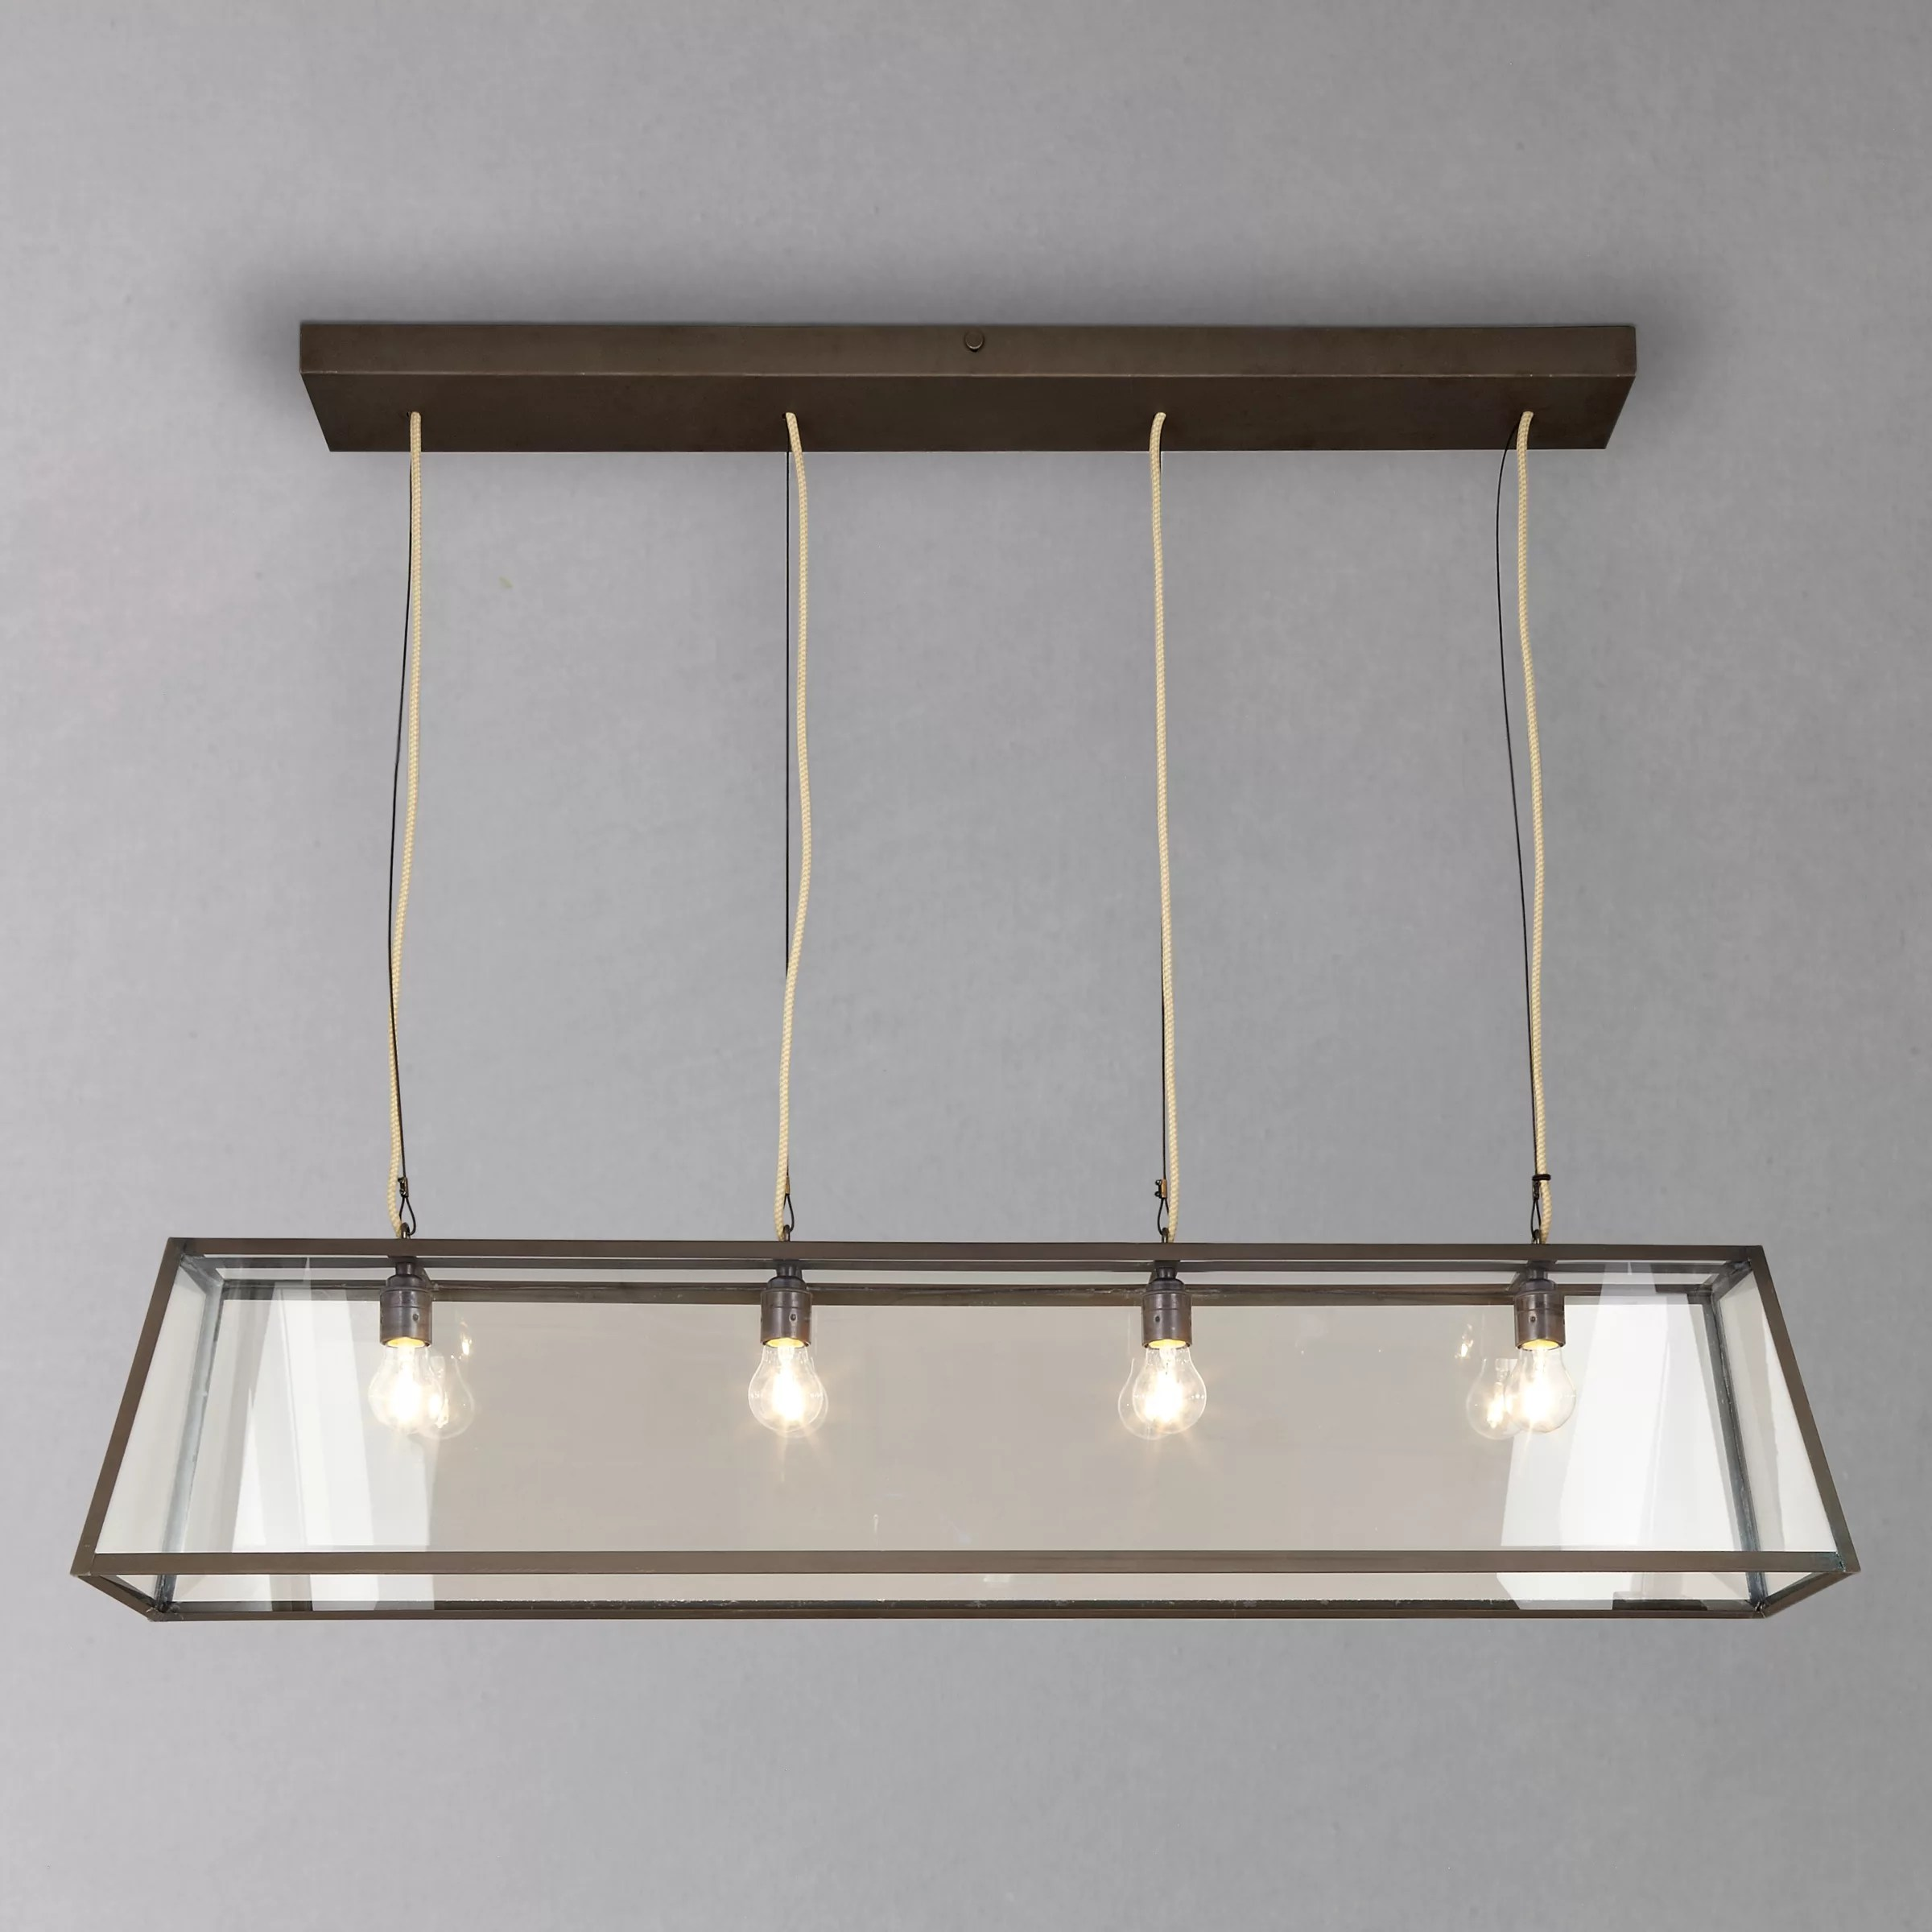 Buy Davey Lighting Triangular Diner Box Ceiling Light